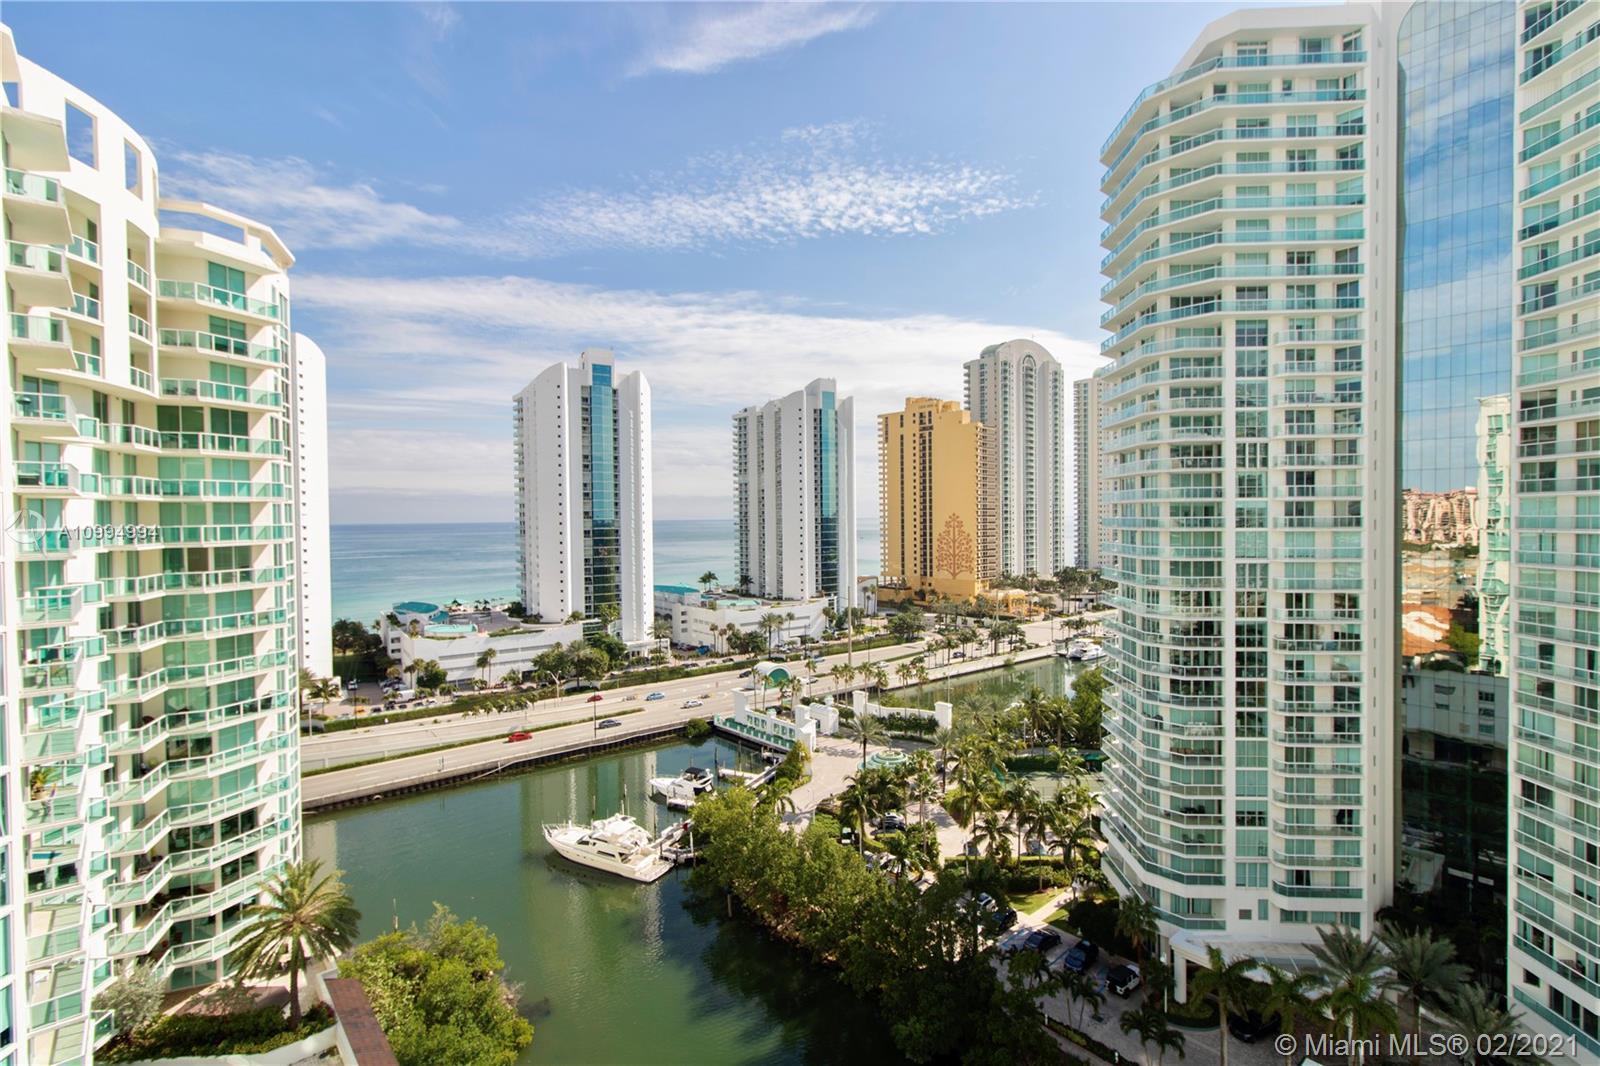 St Tropez II #2-1605 - 200 Sunny Isles Blvd #2-1605, Sunny Isles Beach, FL 33160